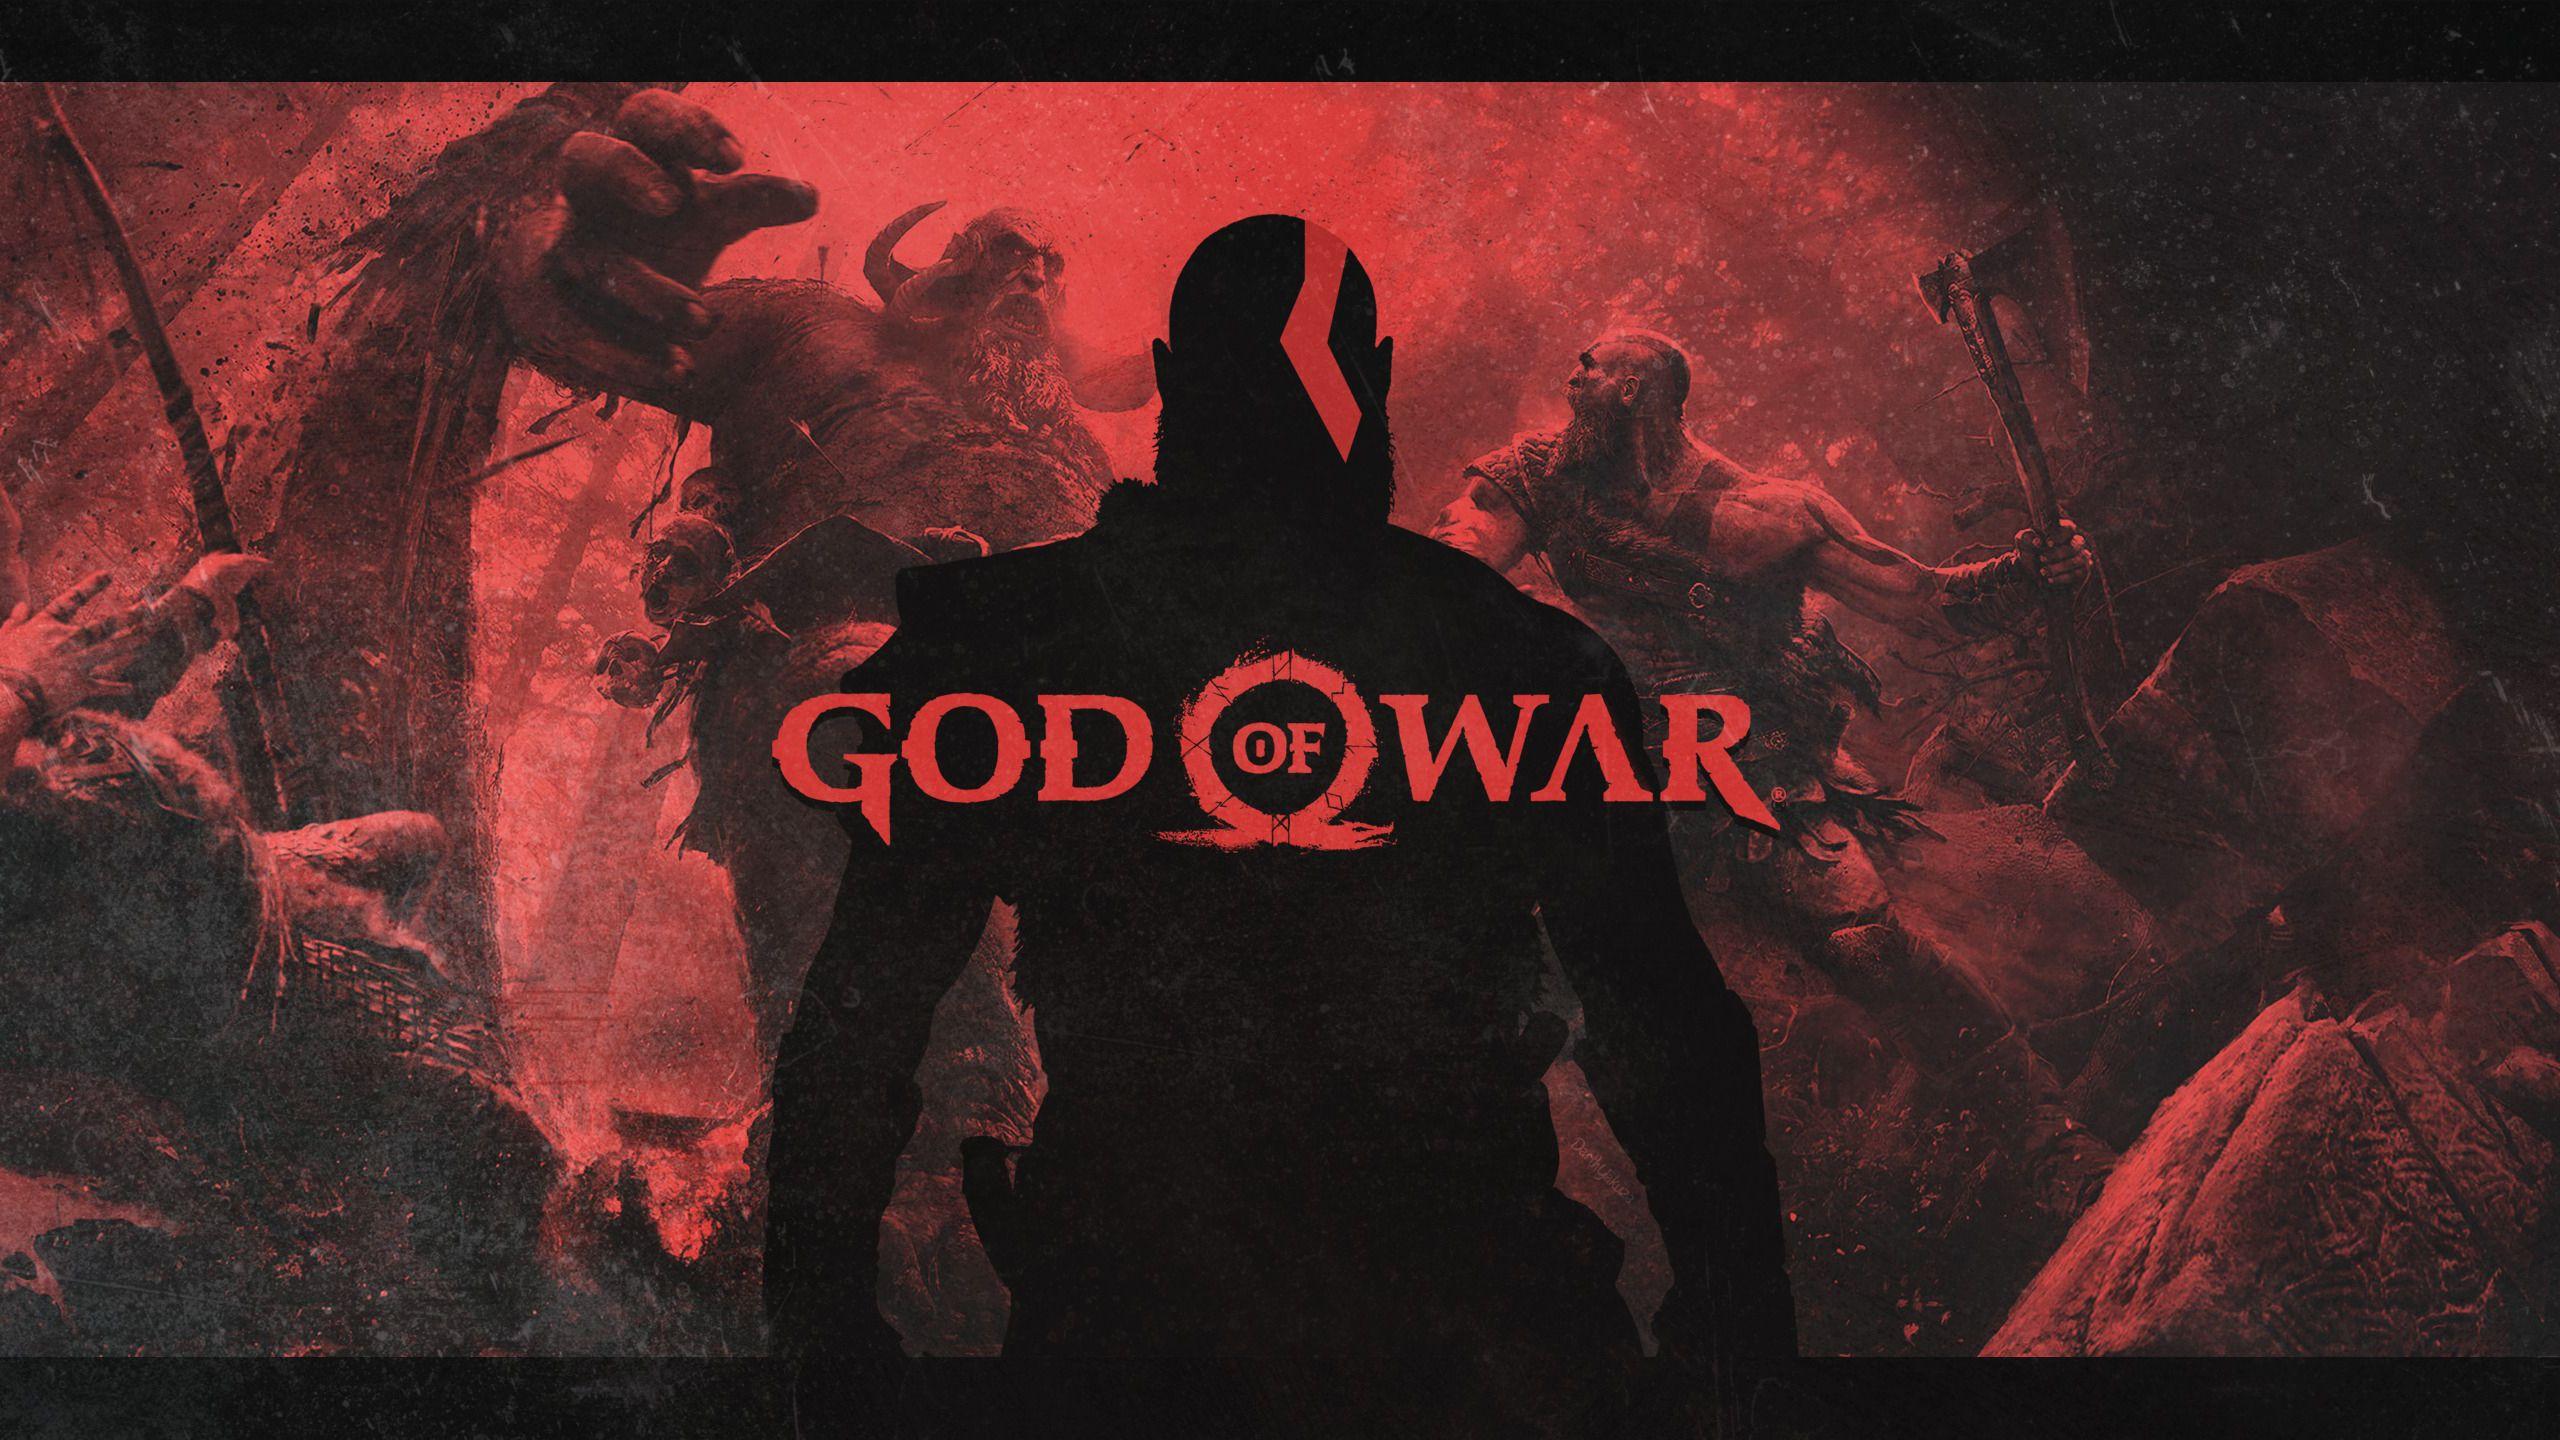 Download 720x1280 Wallpaper Kratos Artwork God Of War Samsung Galaxy Mini S3 S5 Neo Alpha Sony Xperia Compact Z1 Kratos God Of War God Of War Kratos Art